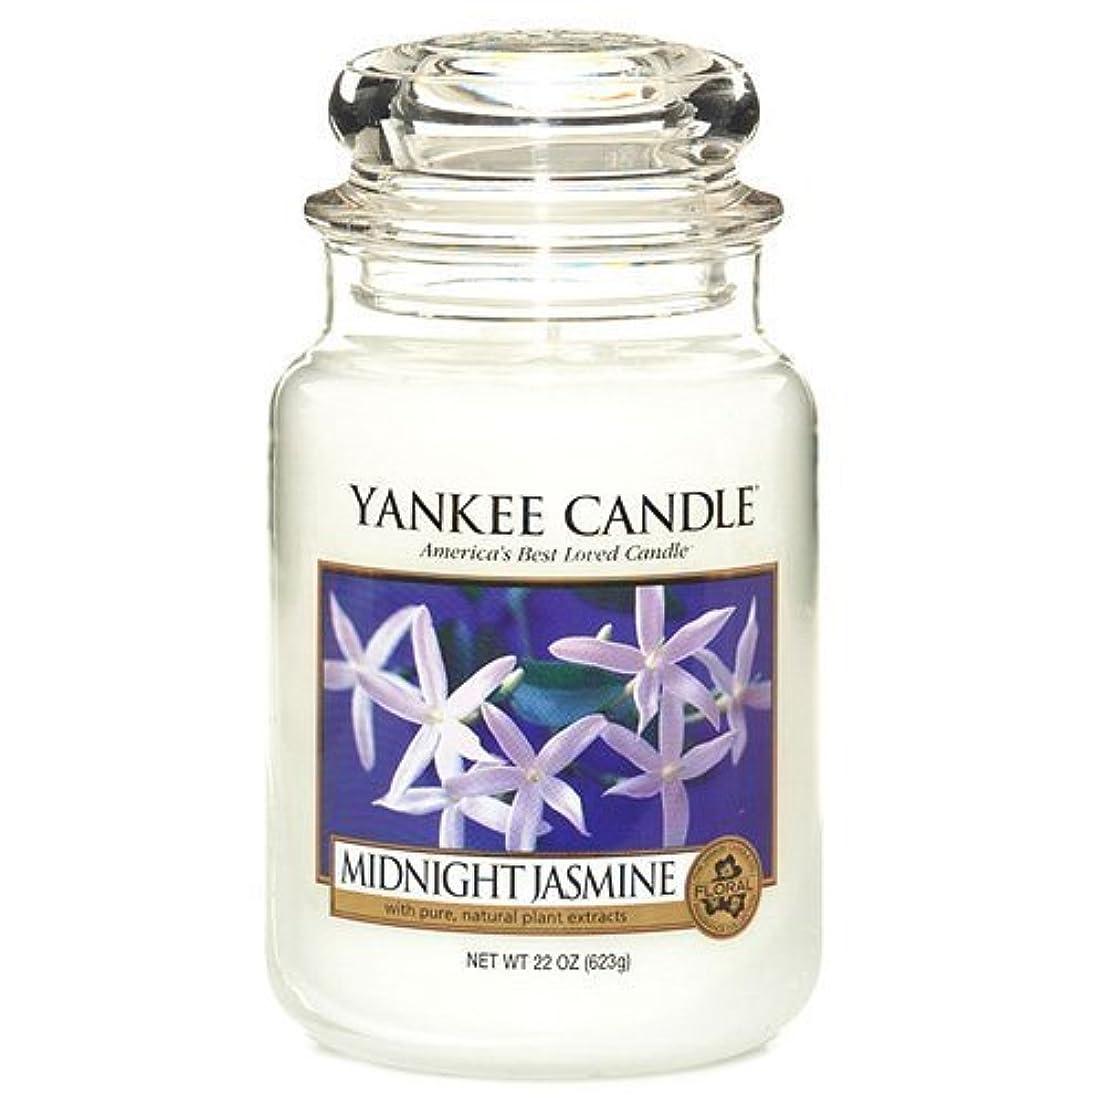 Yankee Candle Housewarmer Jar (Midnight Jasmine) - Large (22 oz) by Yankee Candle [並行輸入品]